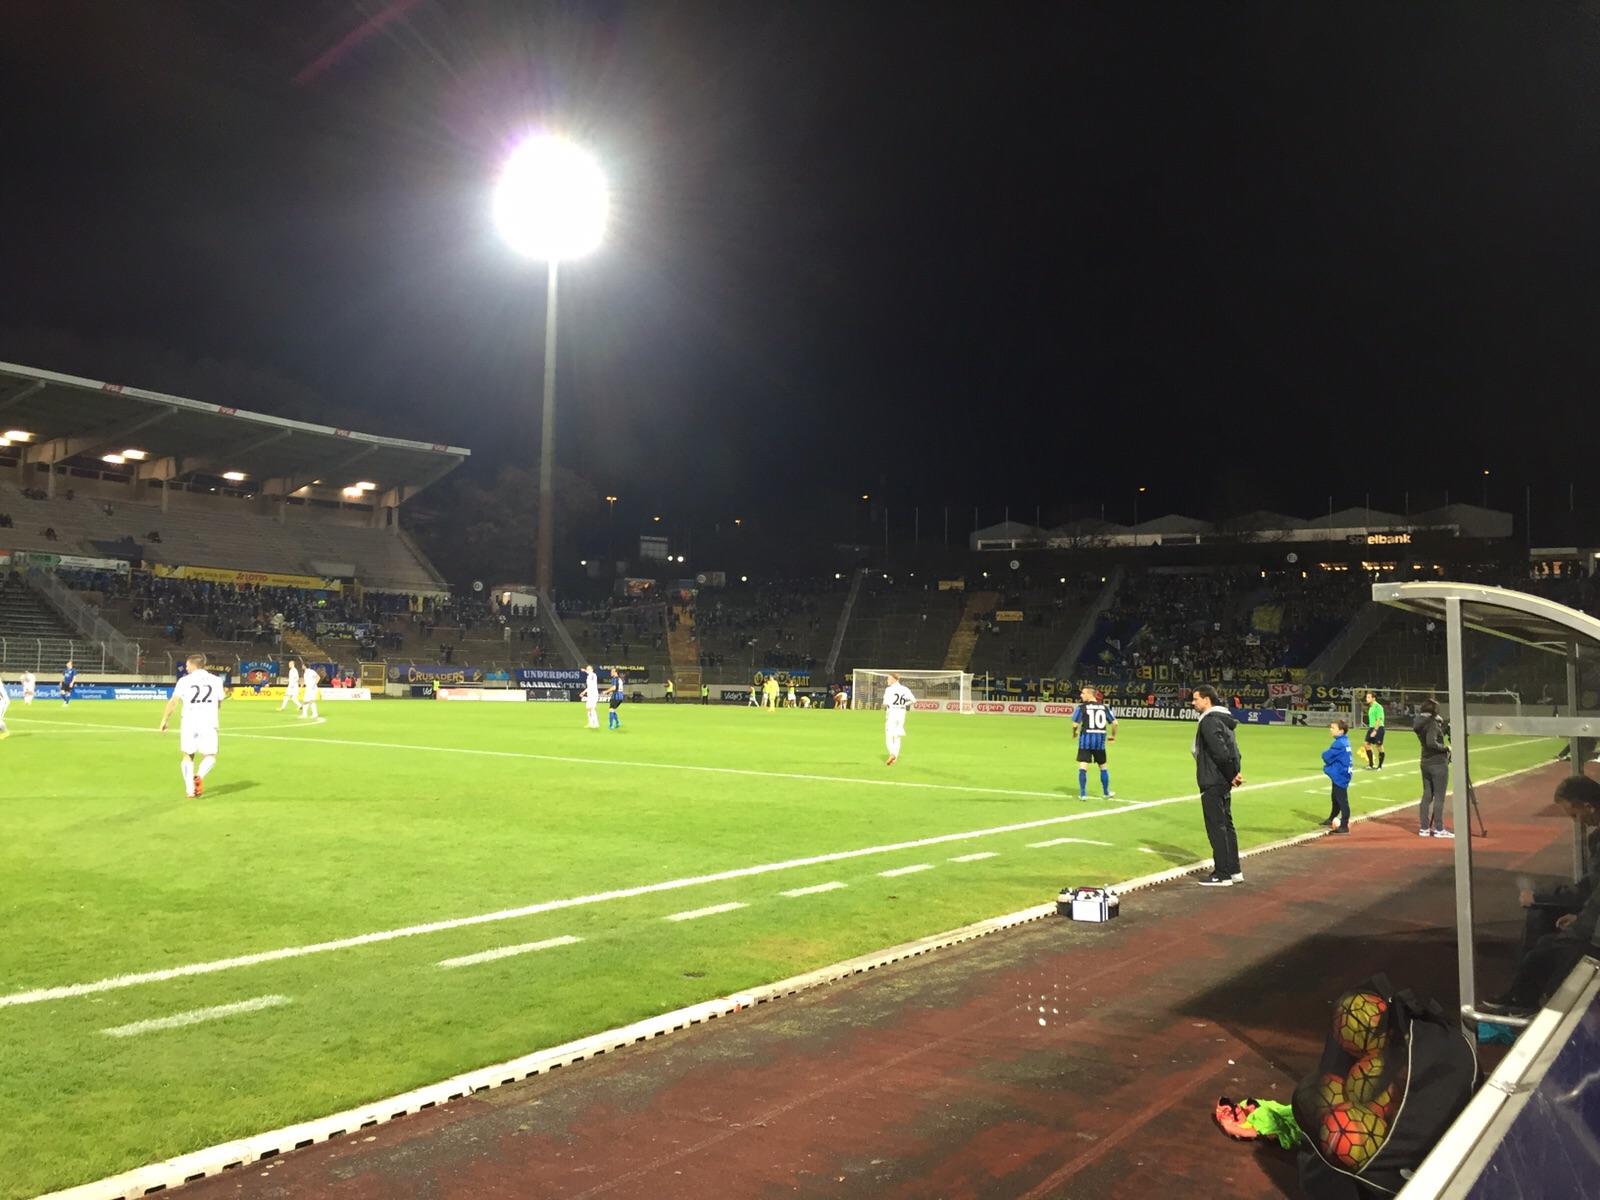 1.FC Saarbr�cken - KSV Hessen: Flutlichtatmosph�re